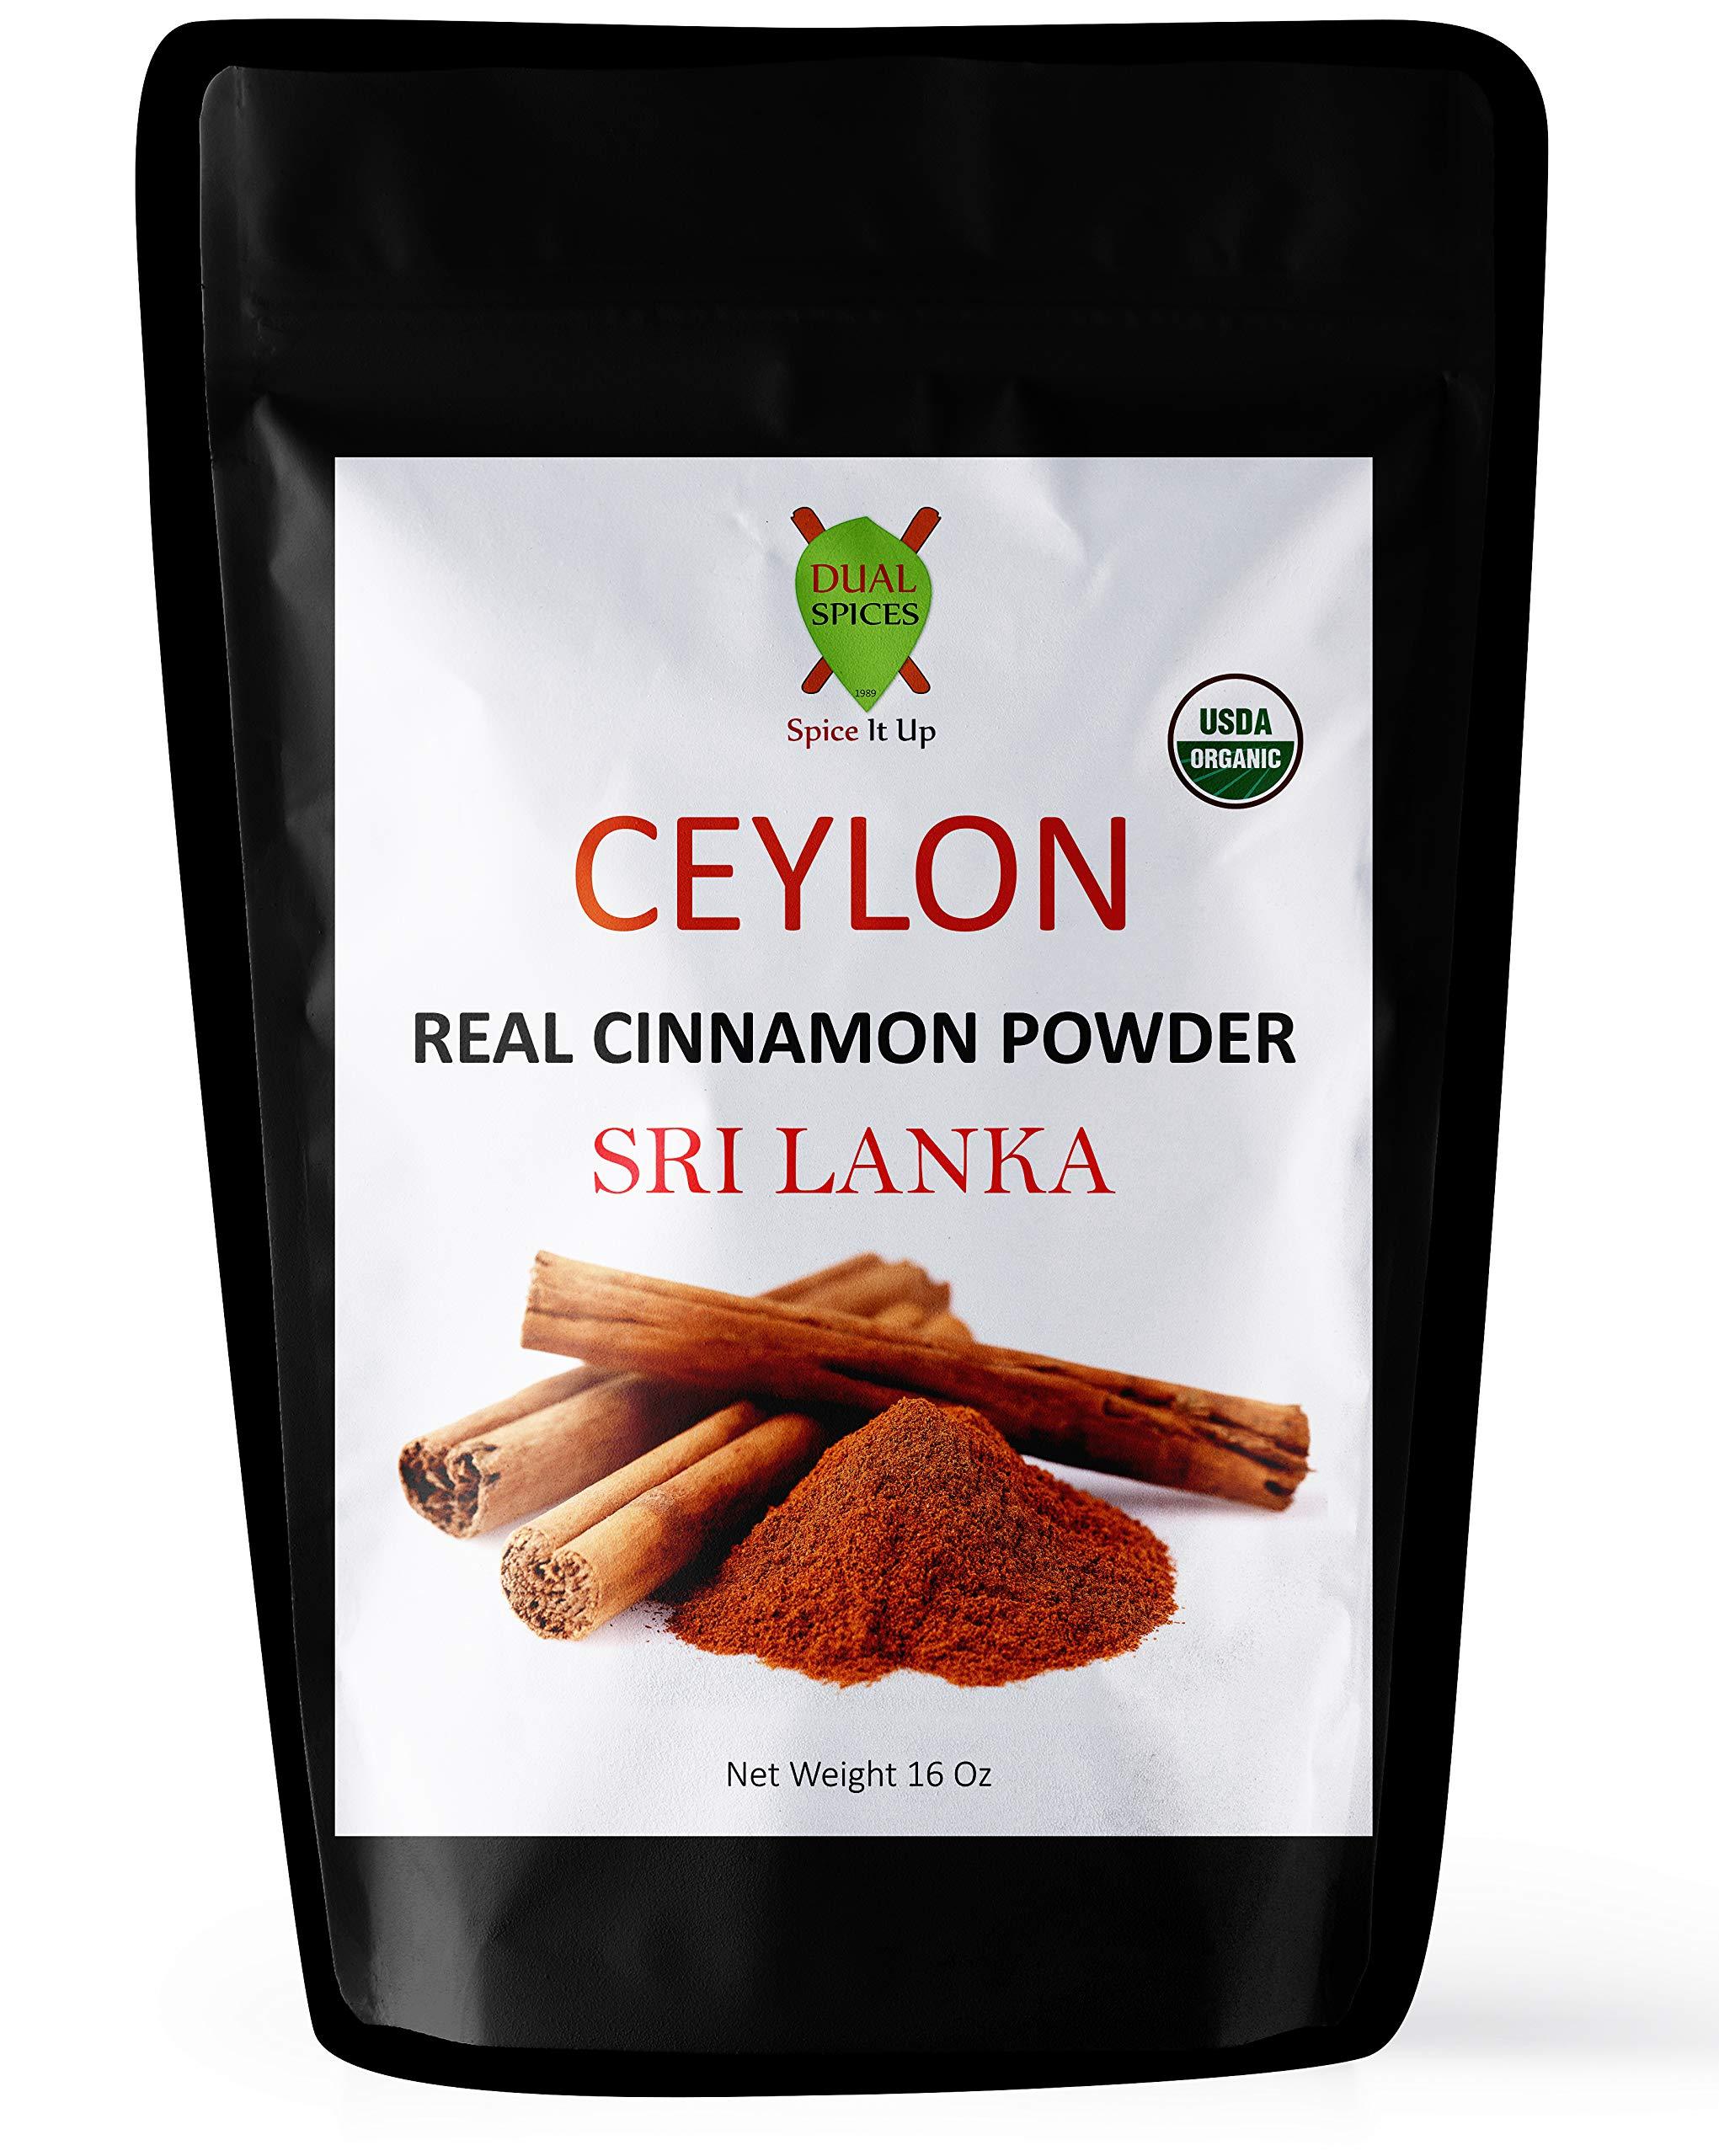 LIMITED TIME SALE - Dualspices Ceylon Cinnamon Powder USDA Certified Organic 1 Pound Bulk, Sri Lanka Real Cinnamon